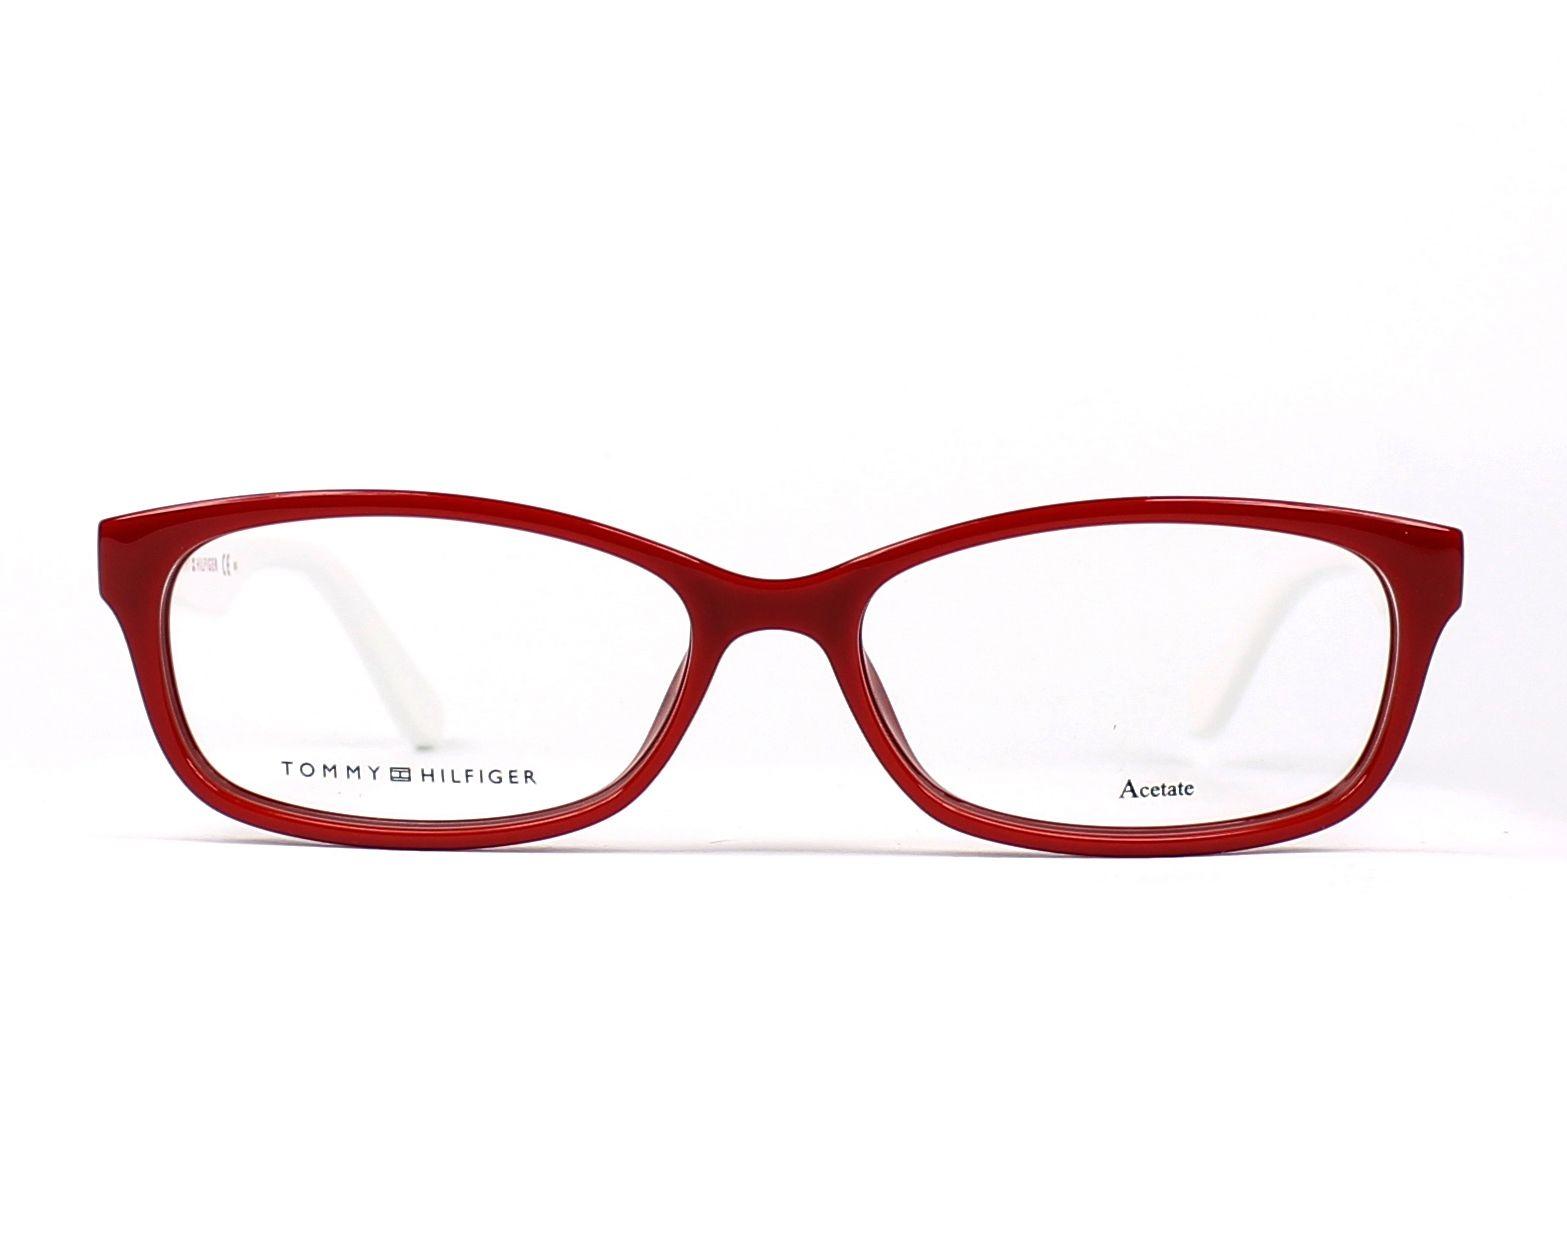 acheter des lunettes de vue tommy hilfiger th 1491 c9a visionet. Black Bedroom Furniture Sets. Home Design Ideas